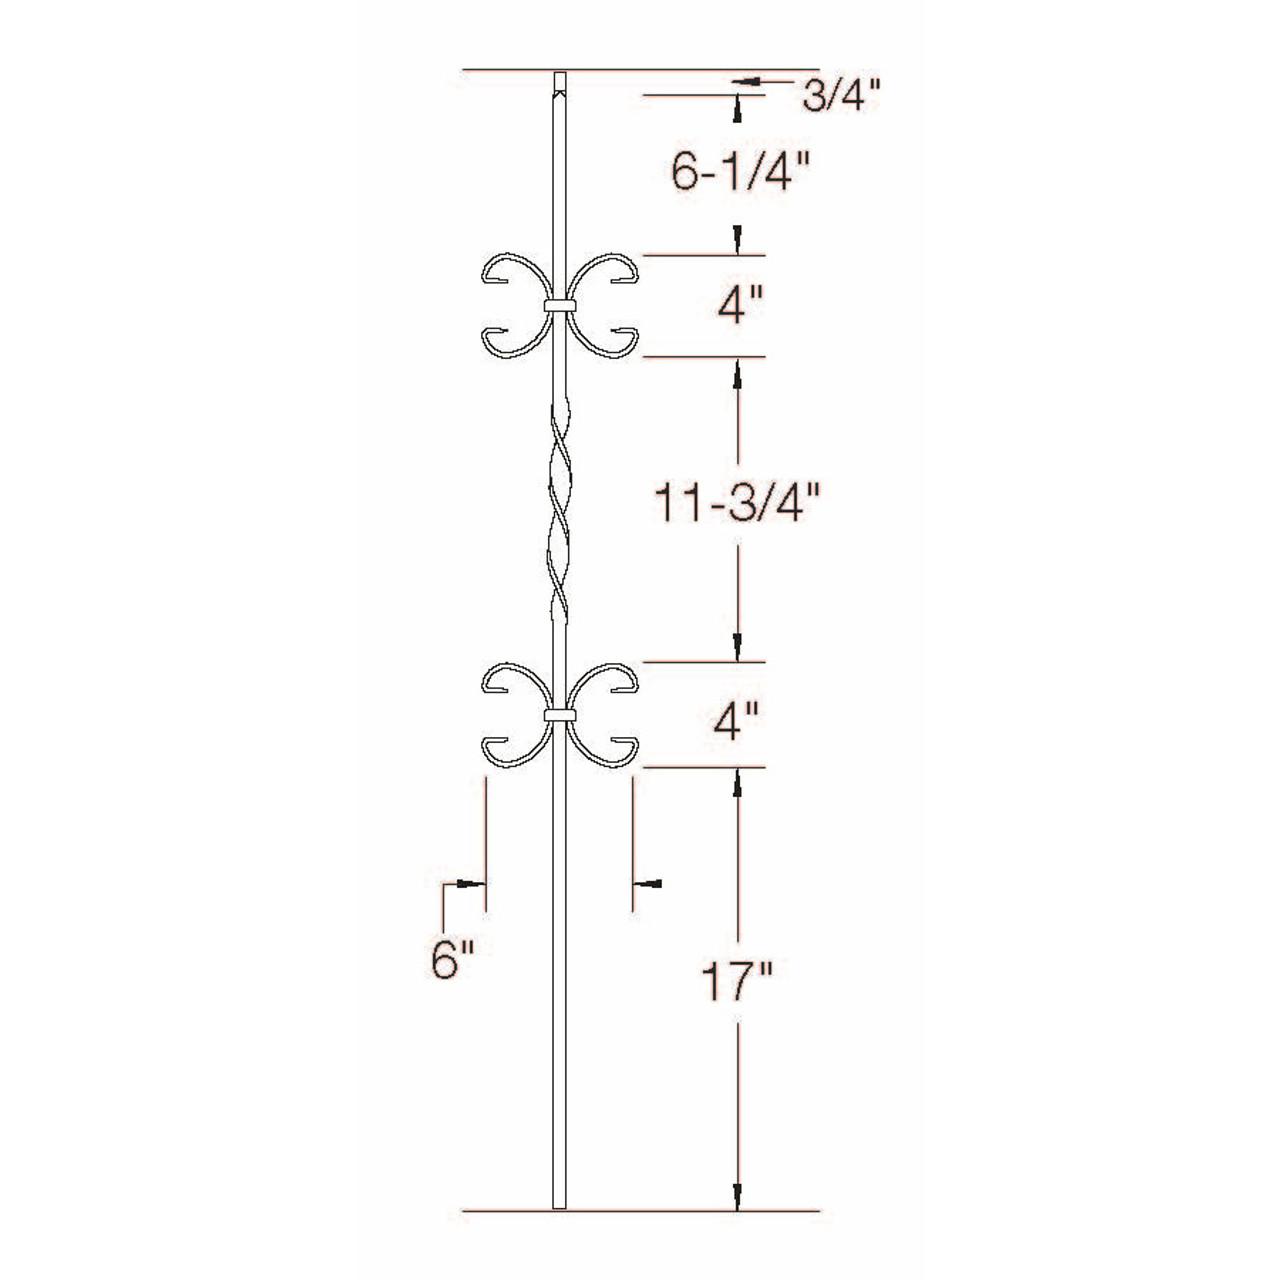 T-11 Double Butterfly, Single Ribbon, Tubular Steel Dimensional Information